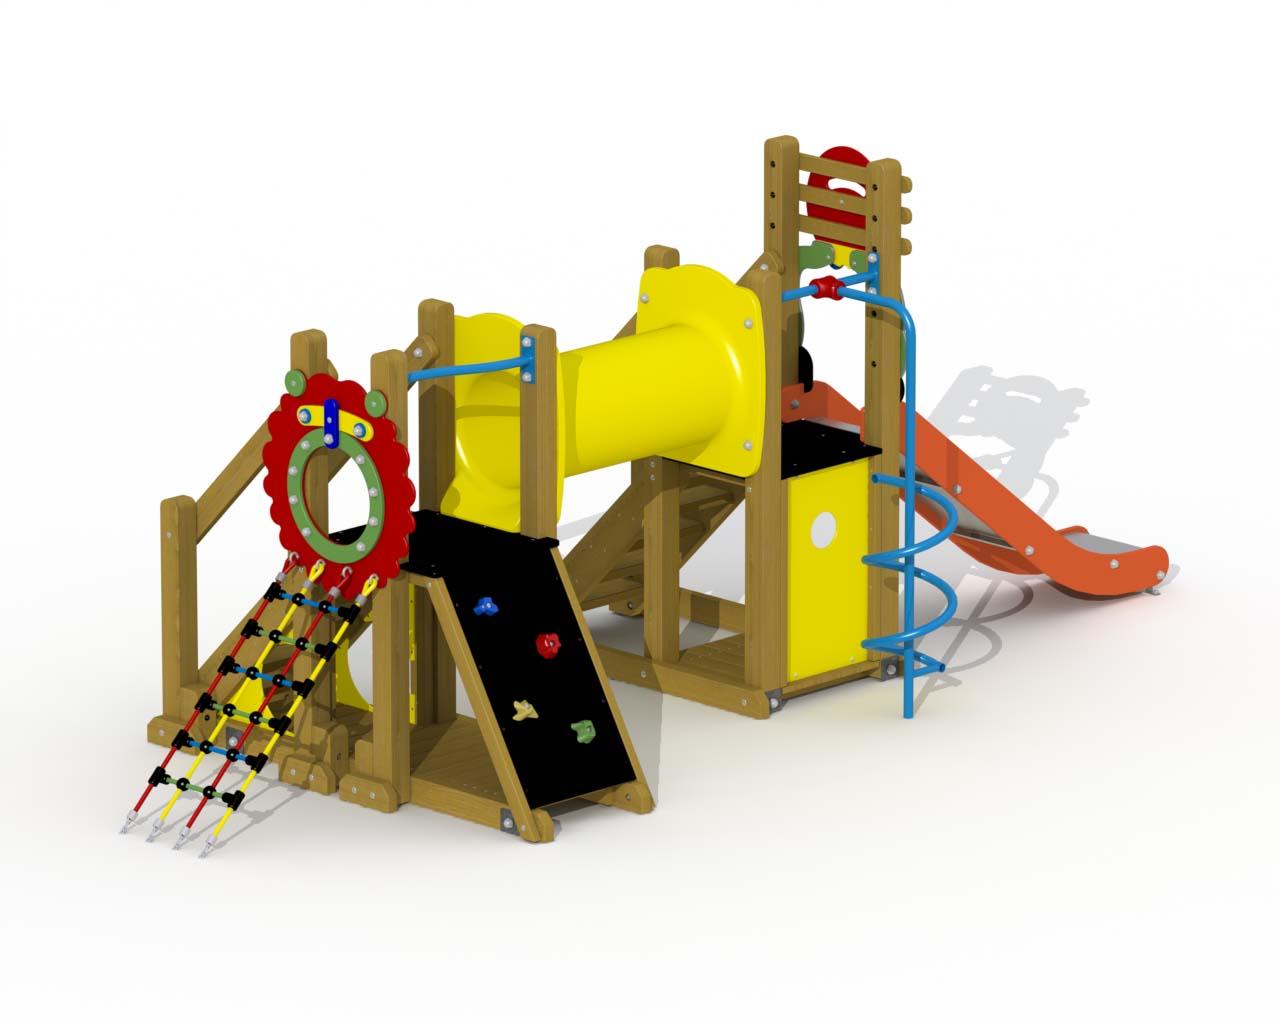 Mammoth (stainless Steel Slide, Crawl Tunnel, Spiral Fireman's Pole)